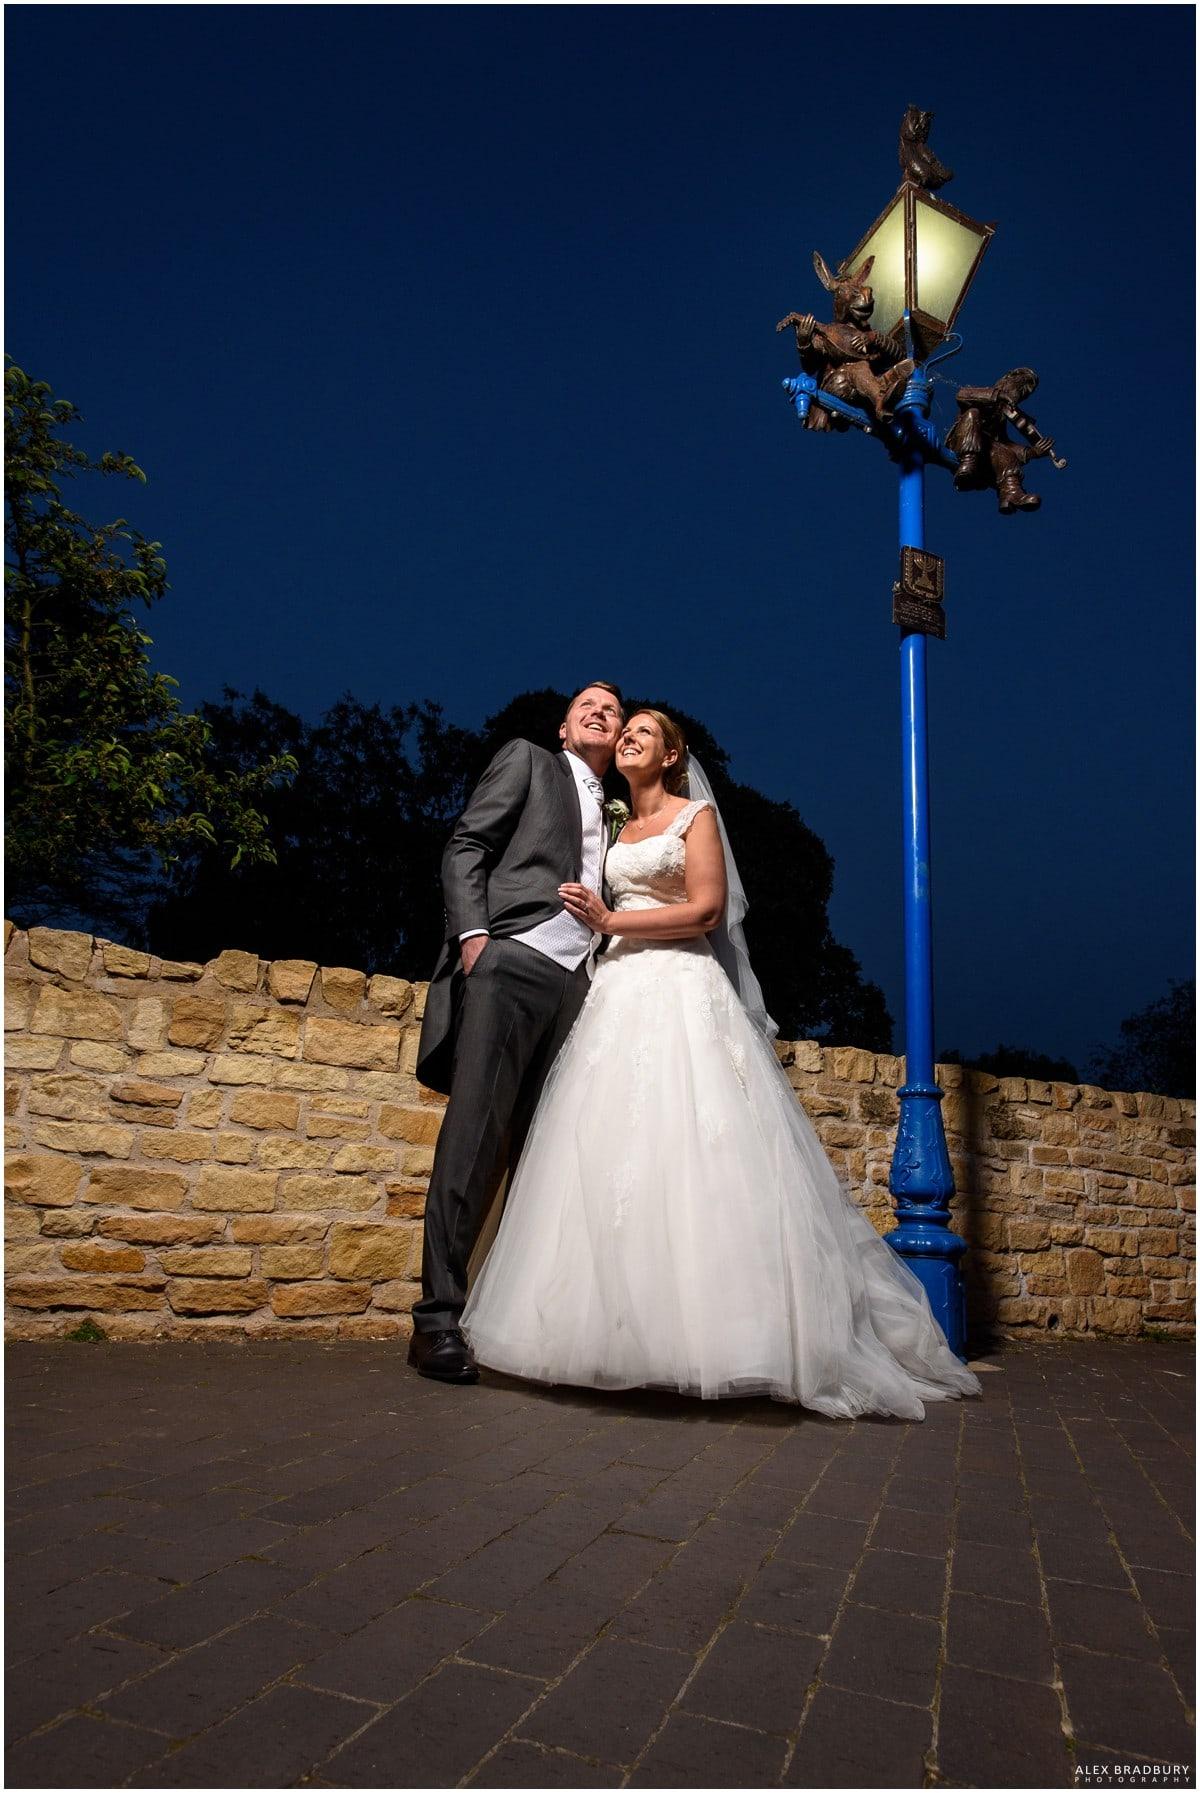 warwickshire-wedding-photographer-2016-favourites-14